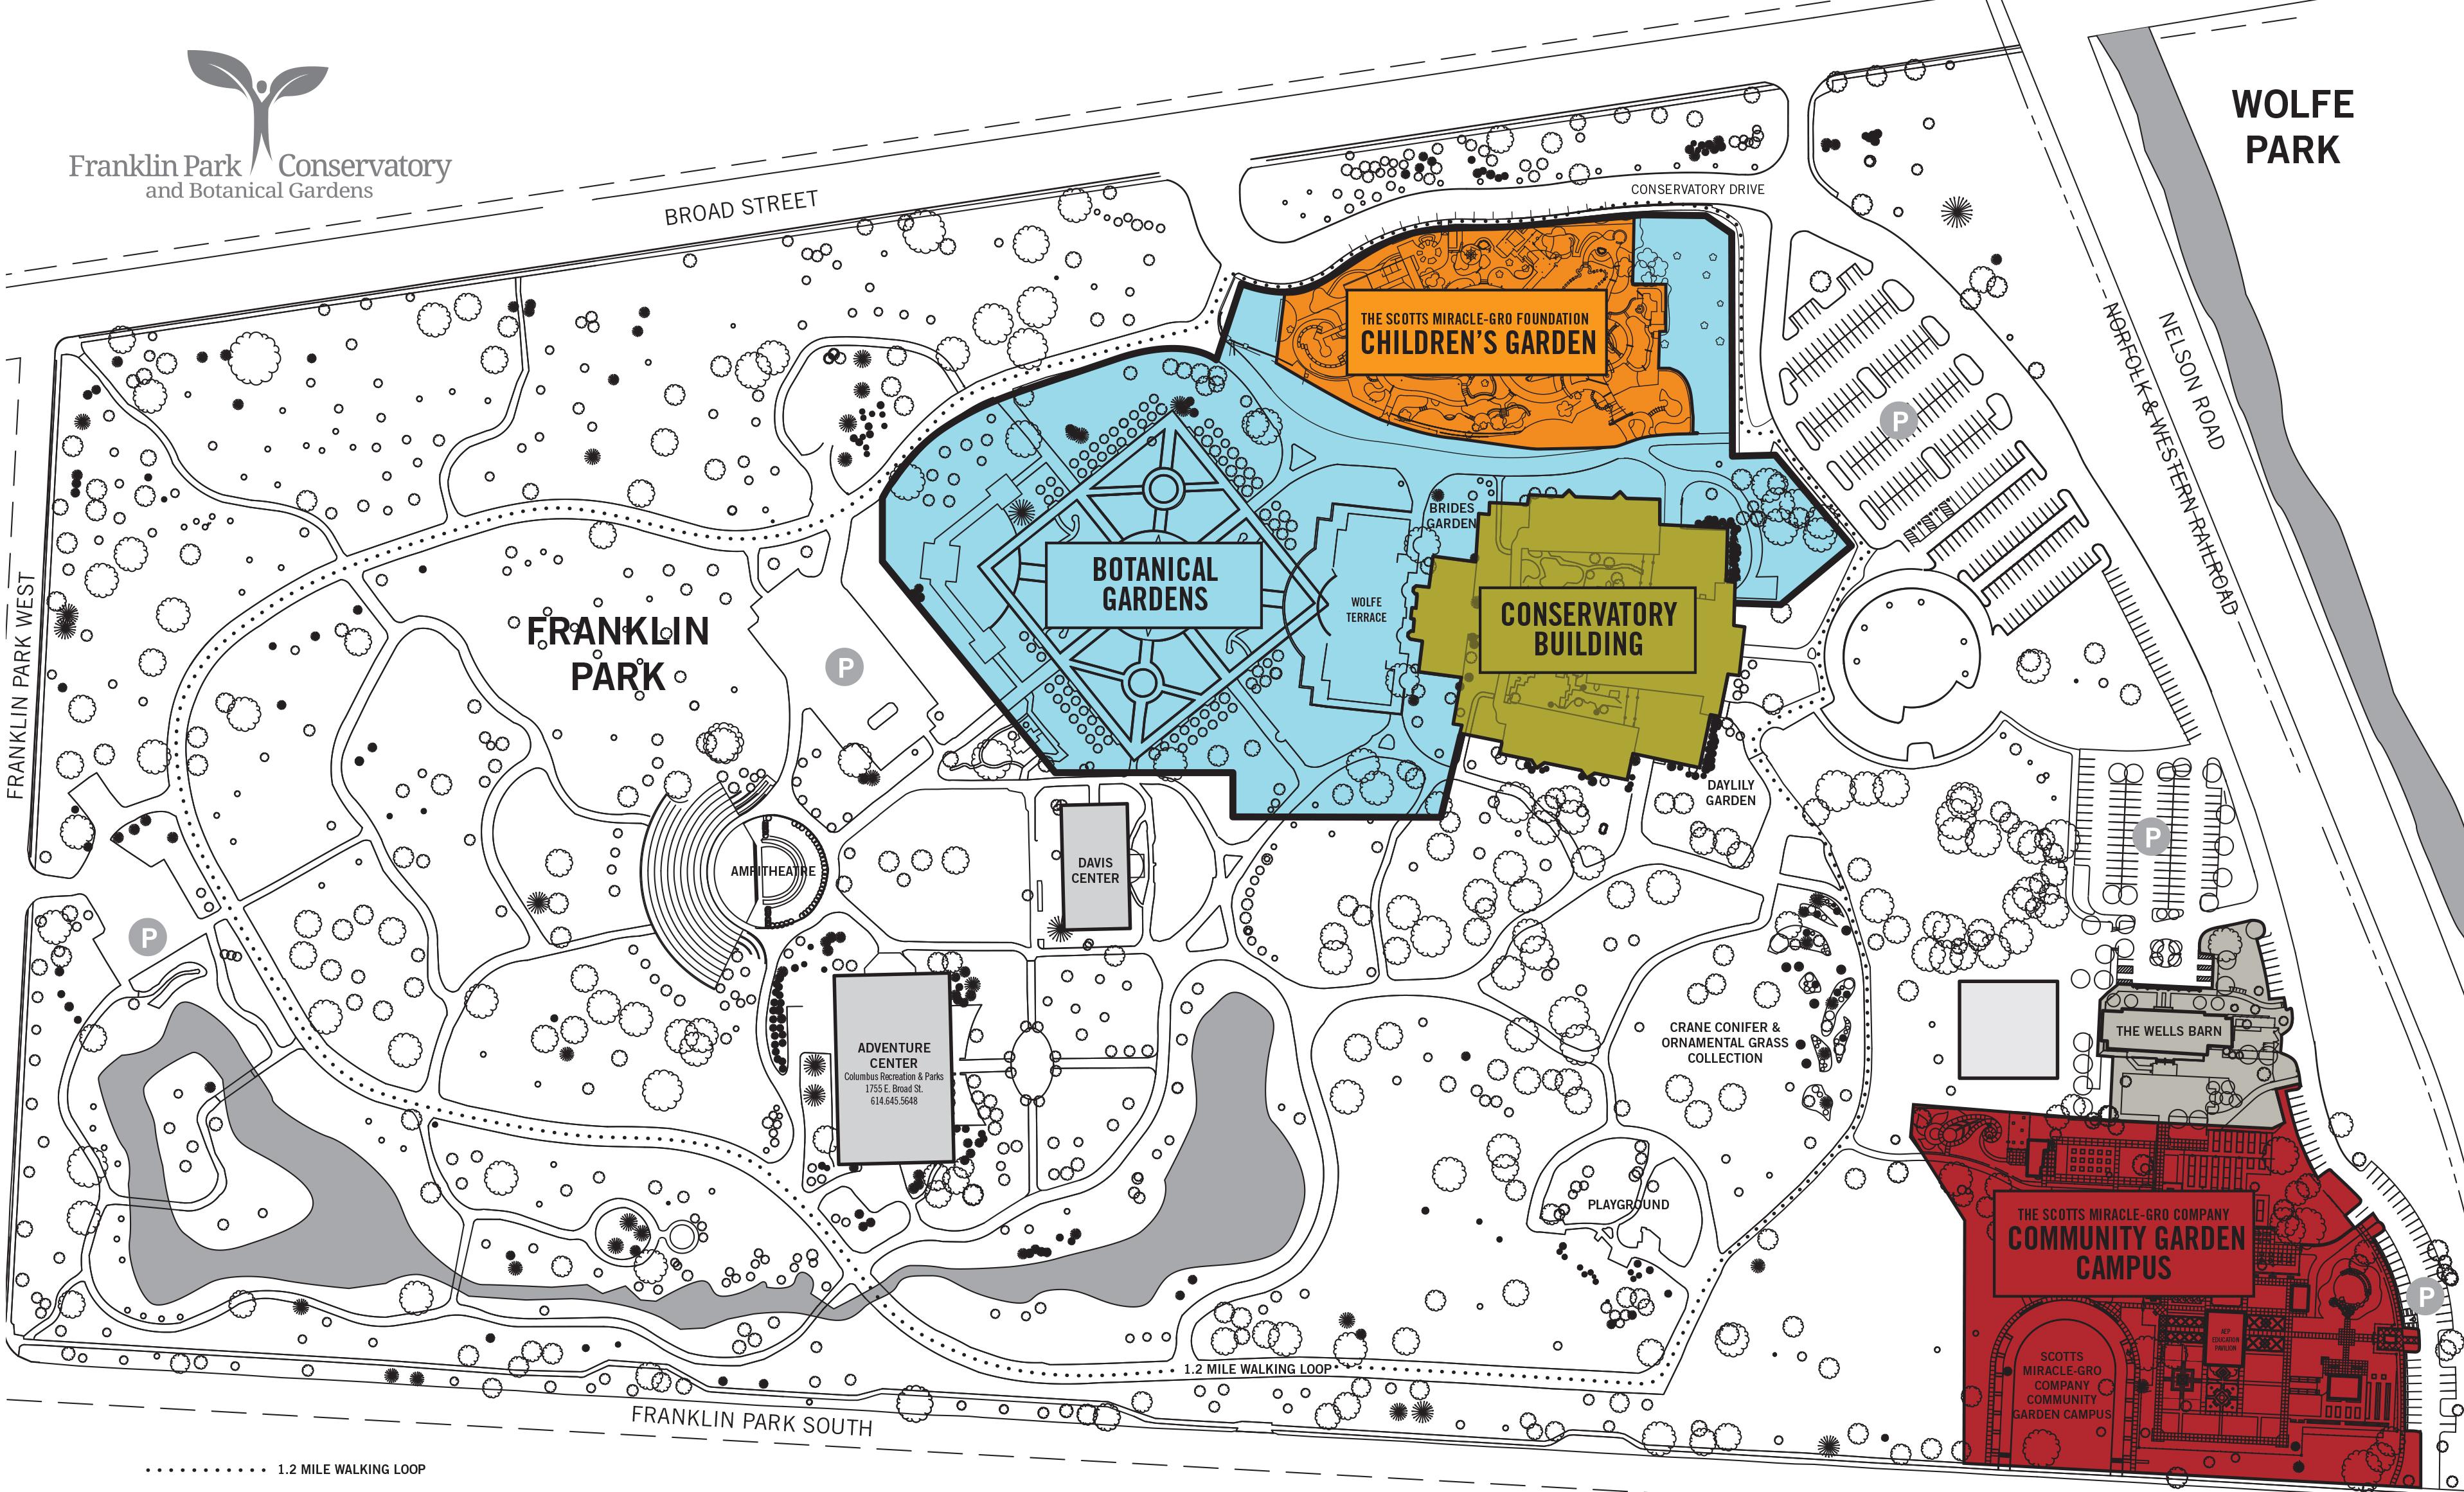 Plan a Visit | Franklin Park Conservatory and Botanical Gardens